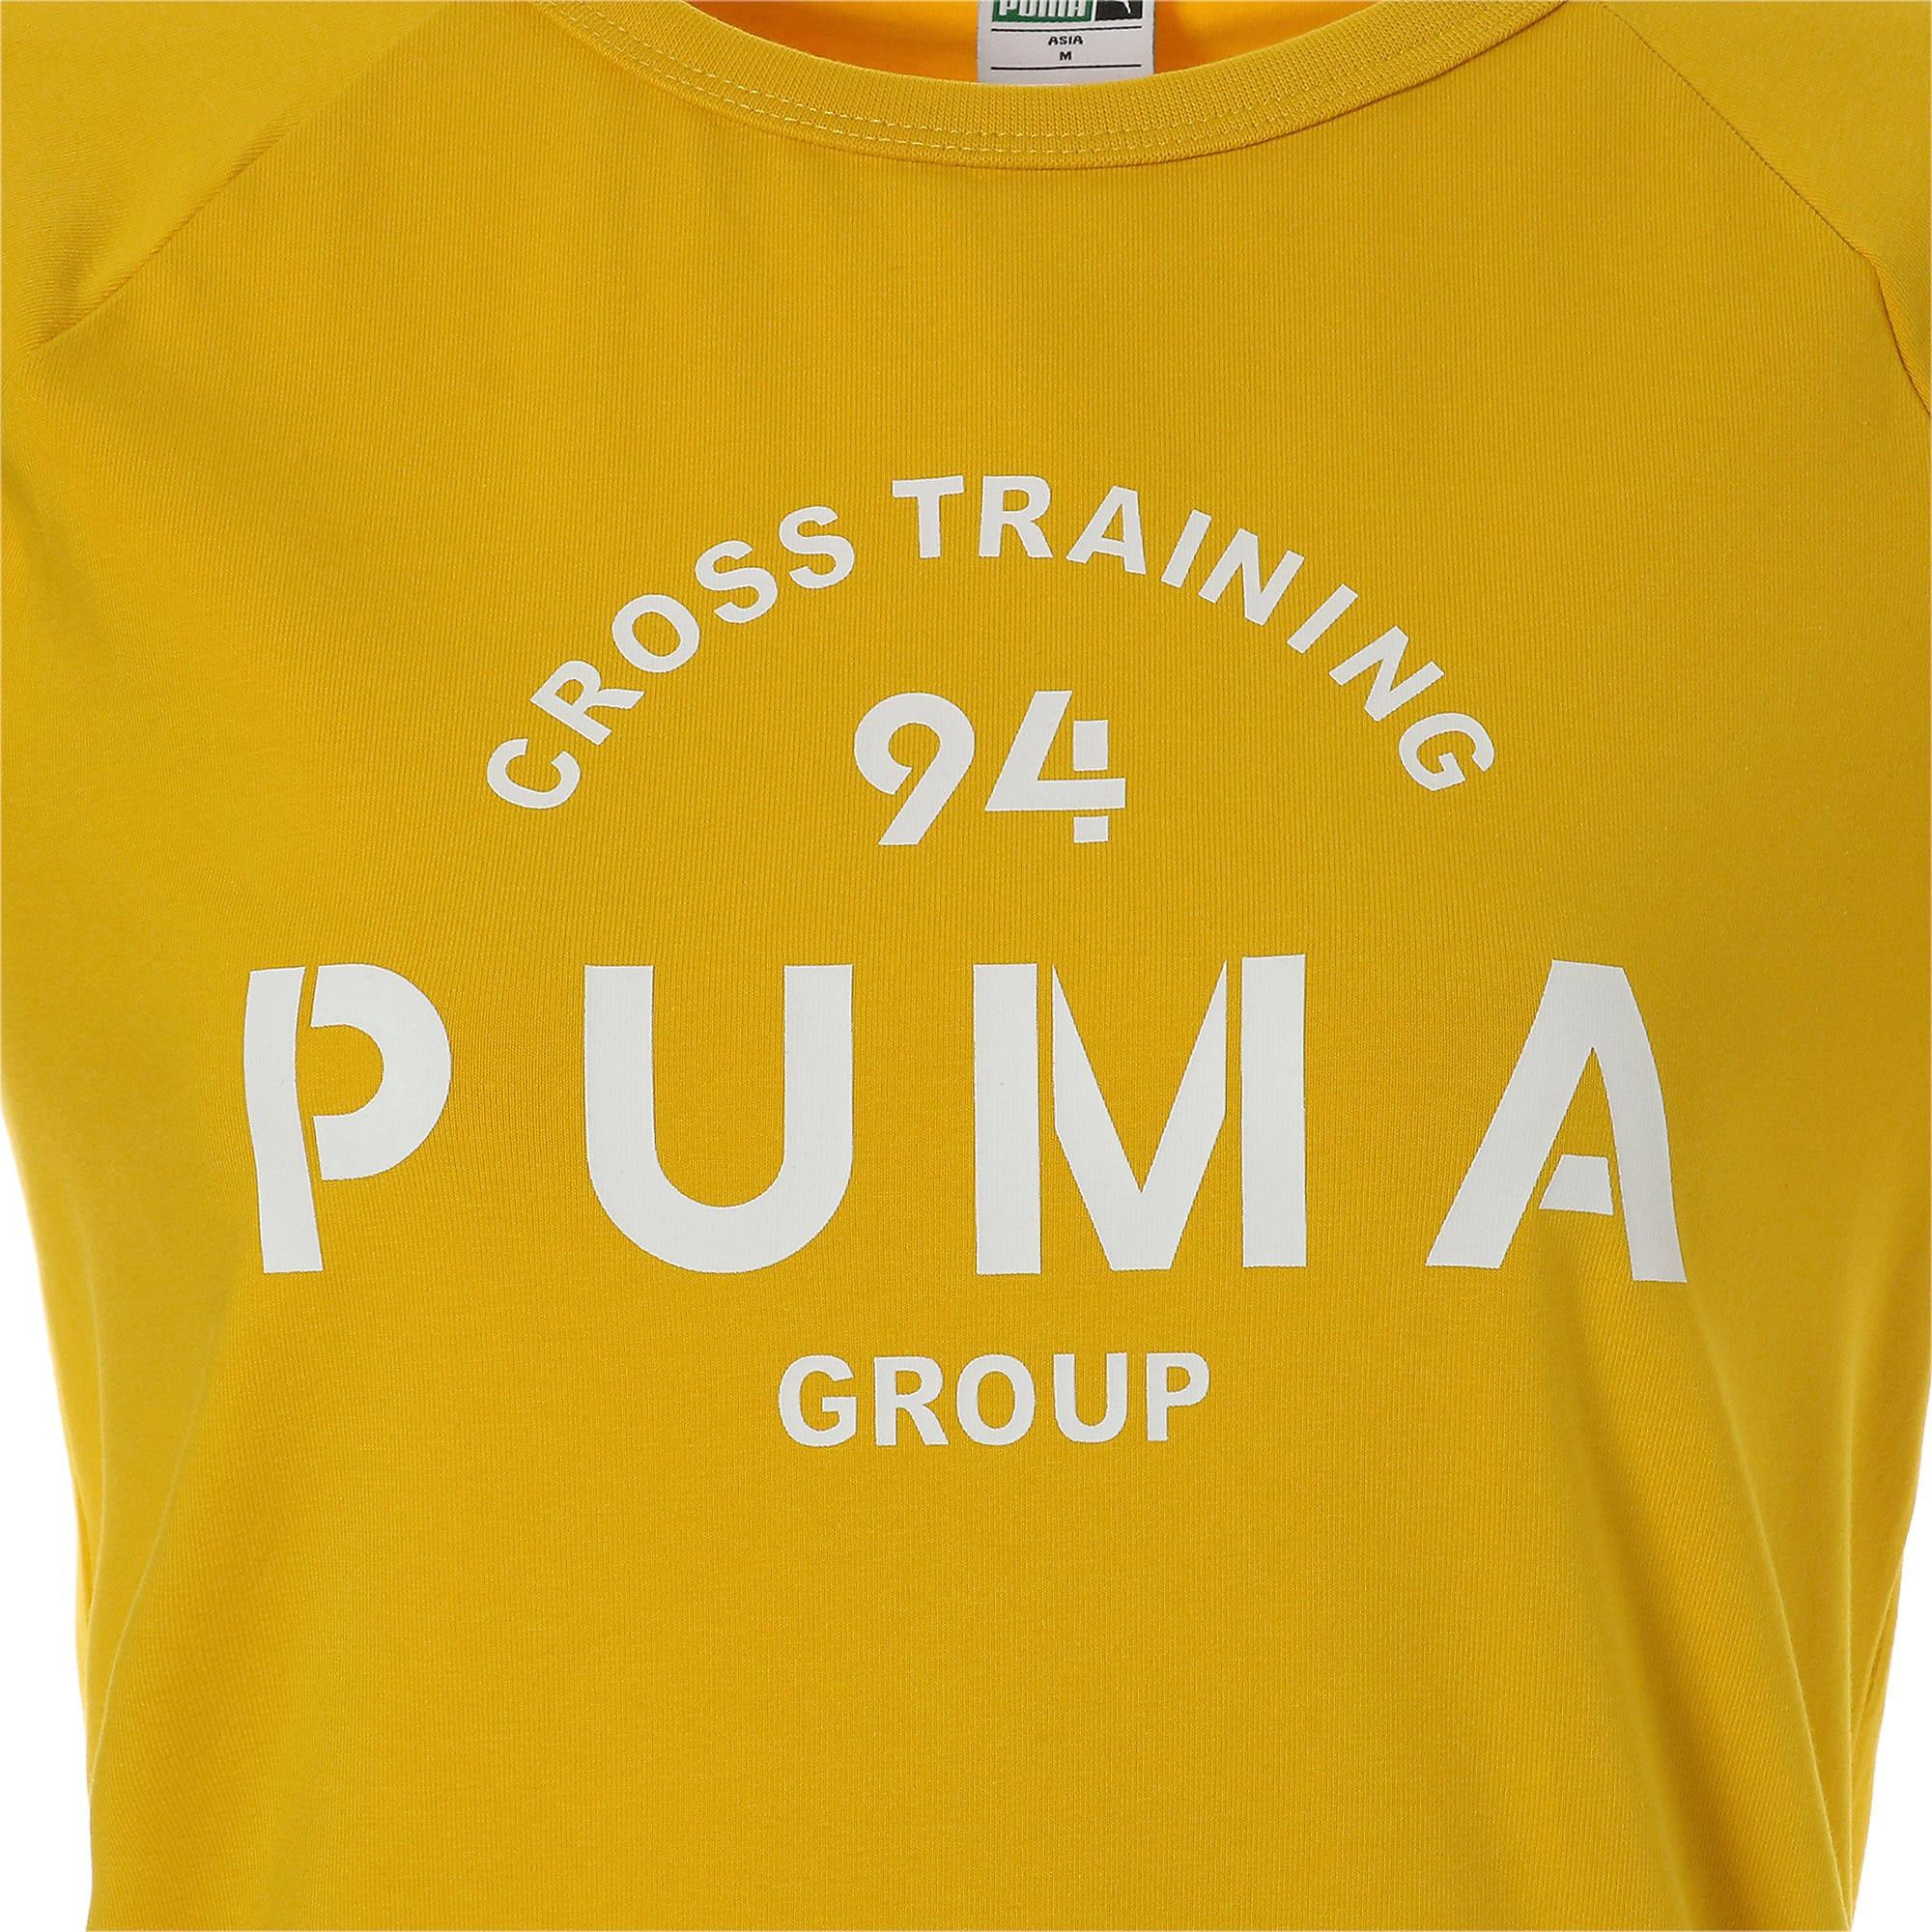 Thumbnail 10 of プーマ XTG ウィメンズ グラフィック SS Tシャツ 半袖, Sulphur, medium-JPN